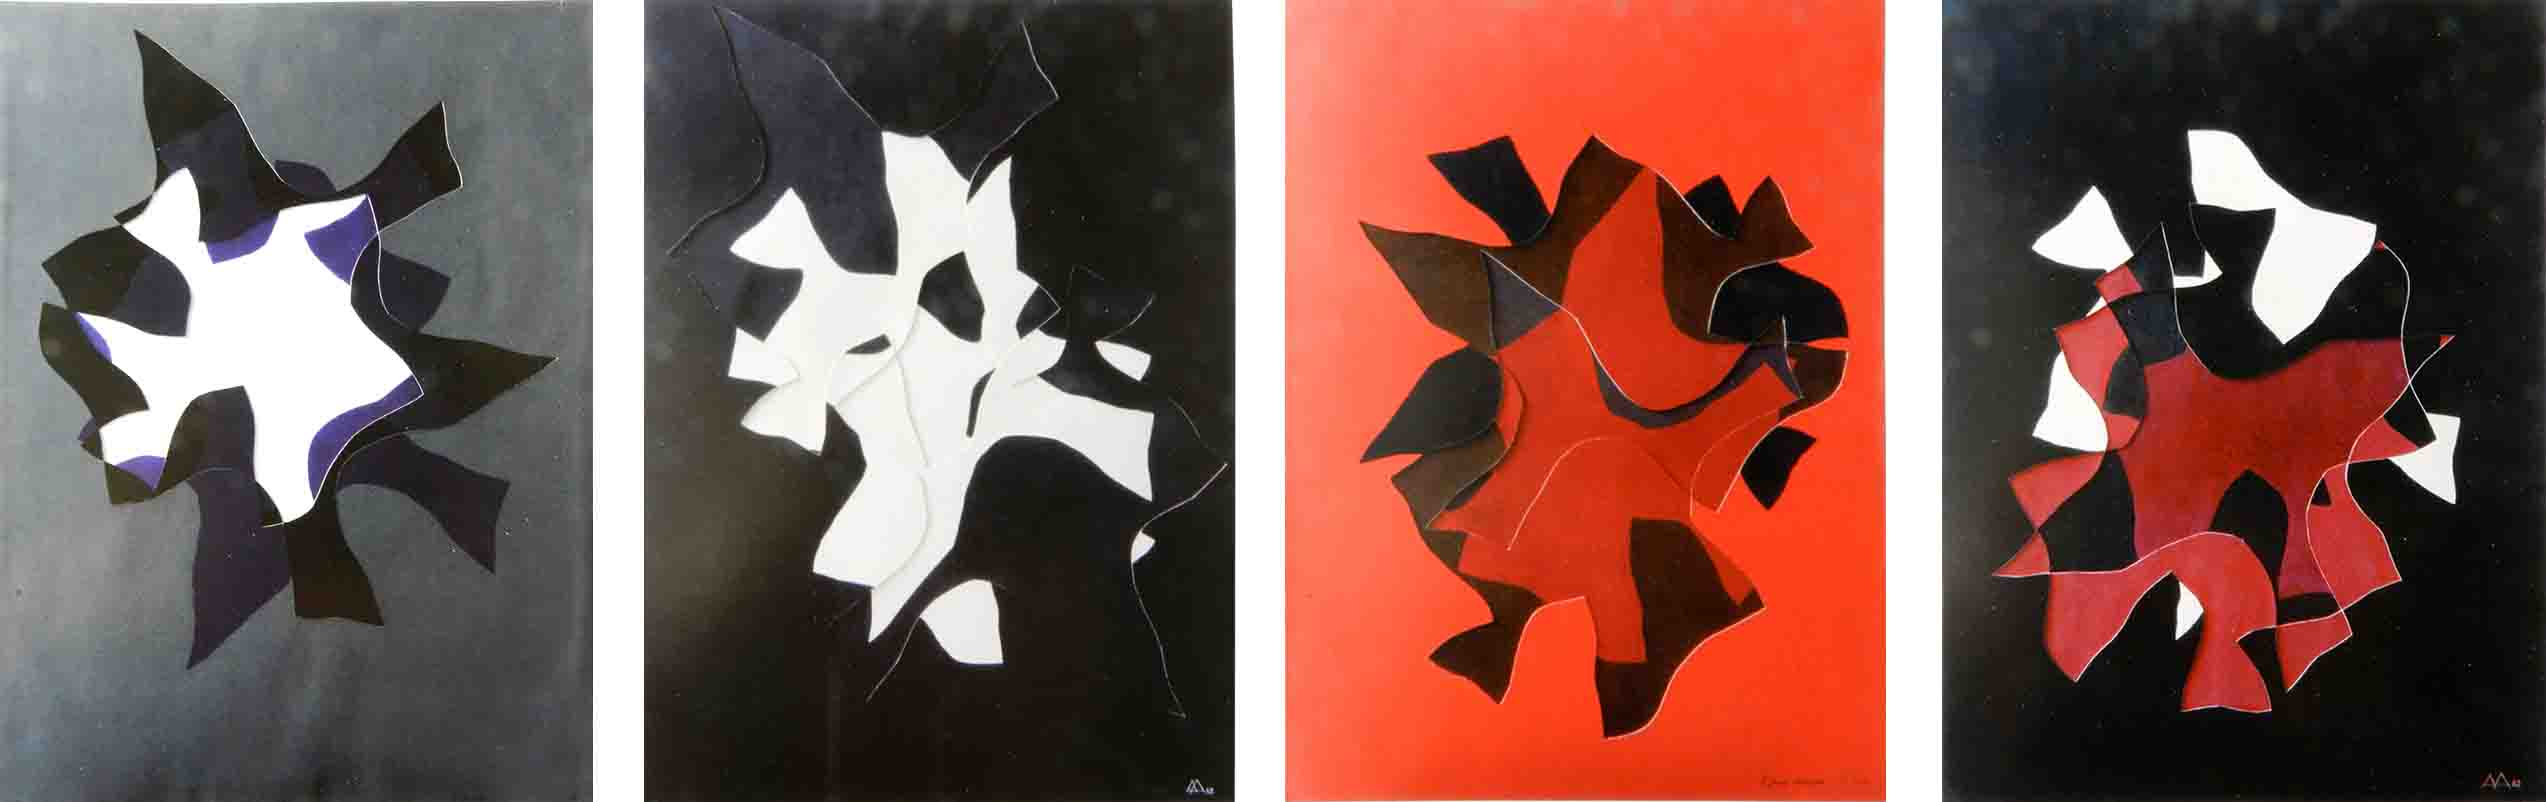 ALBERT AYME - Reliefs Soustractifs - Auto-phanie - 1962